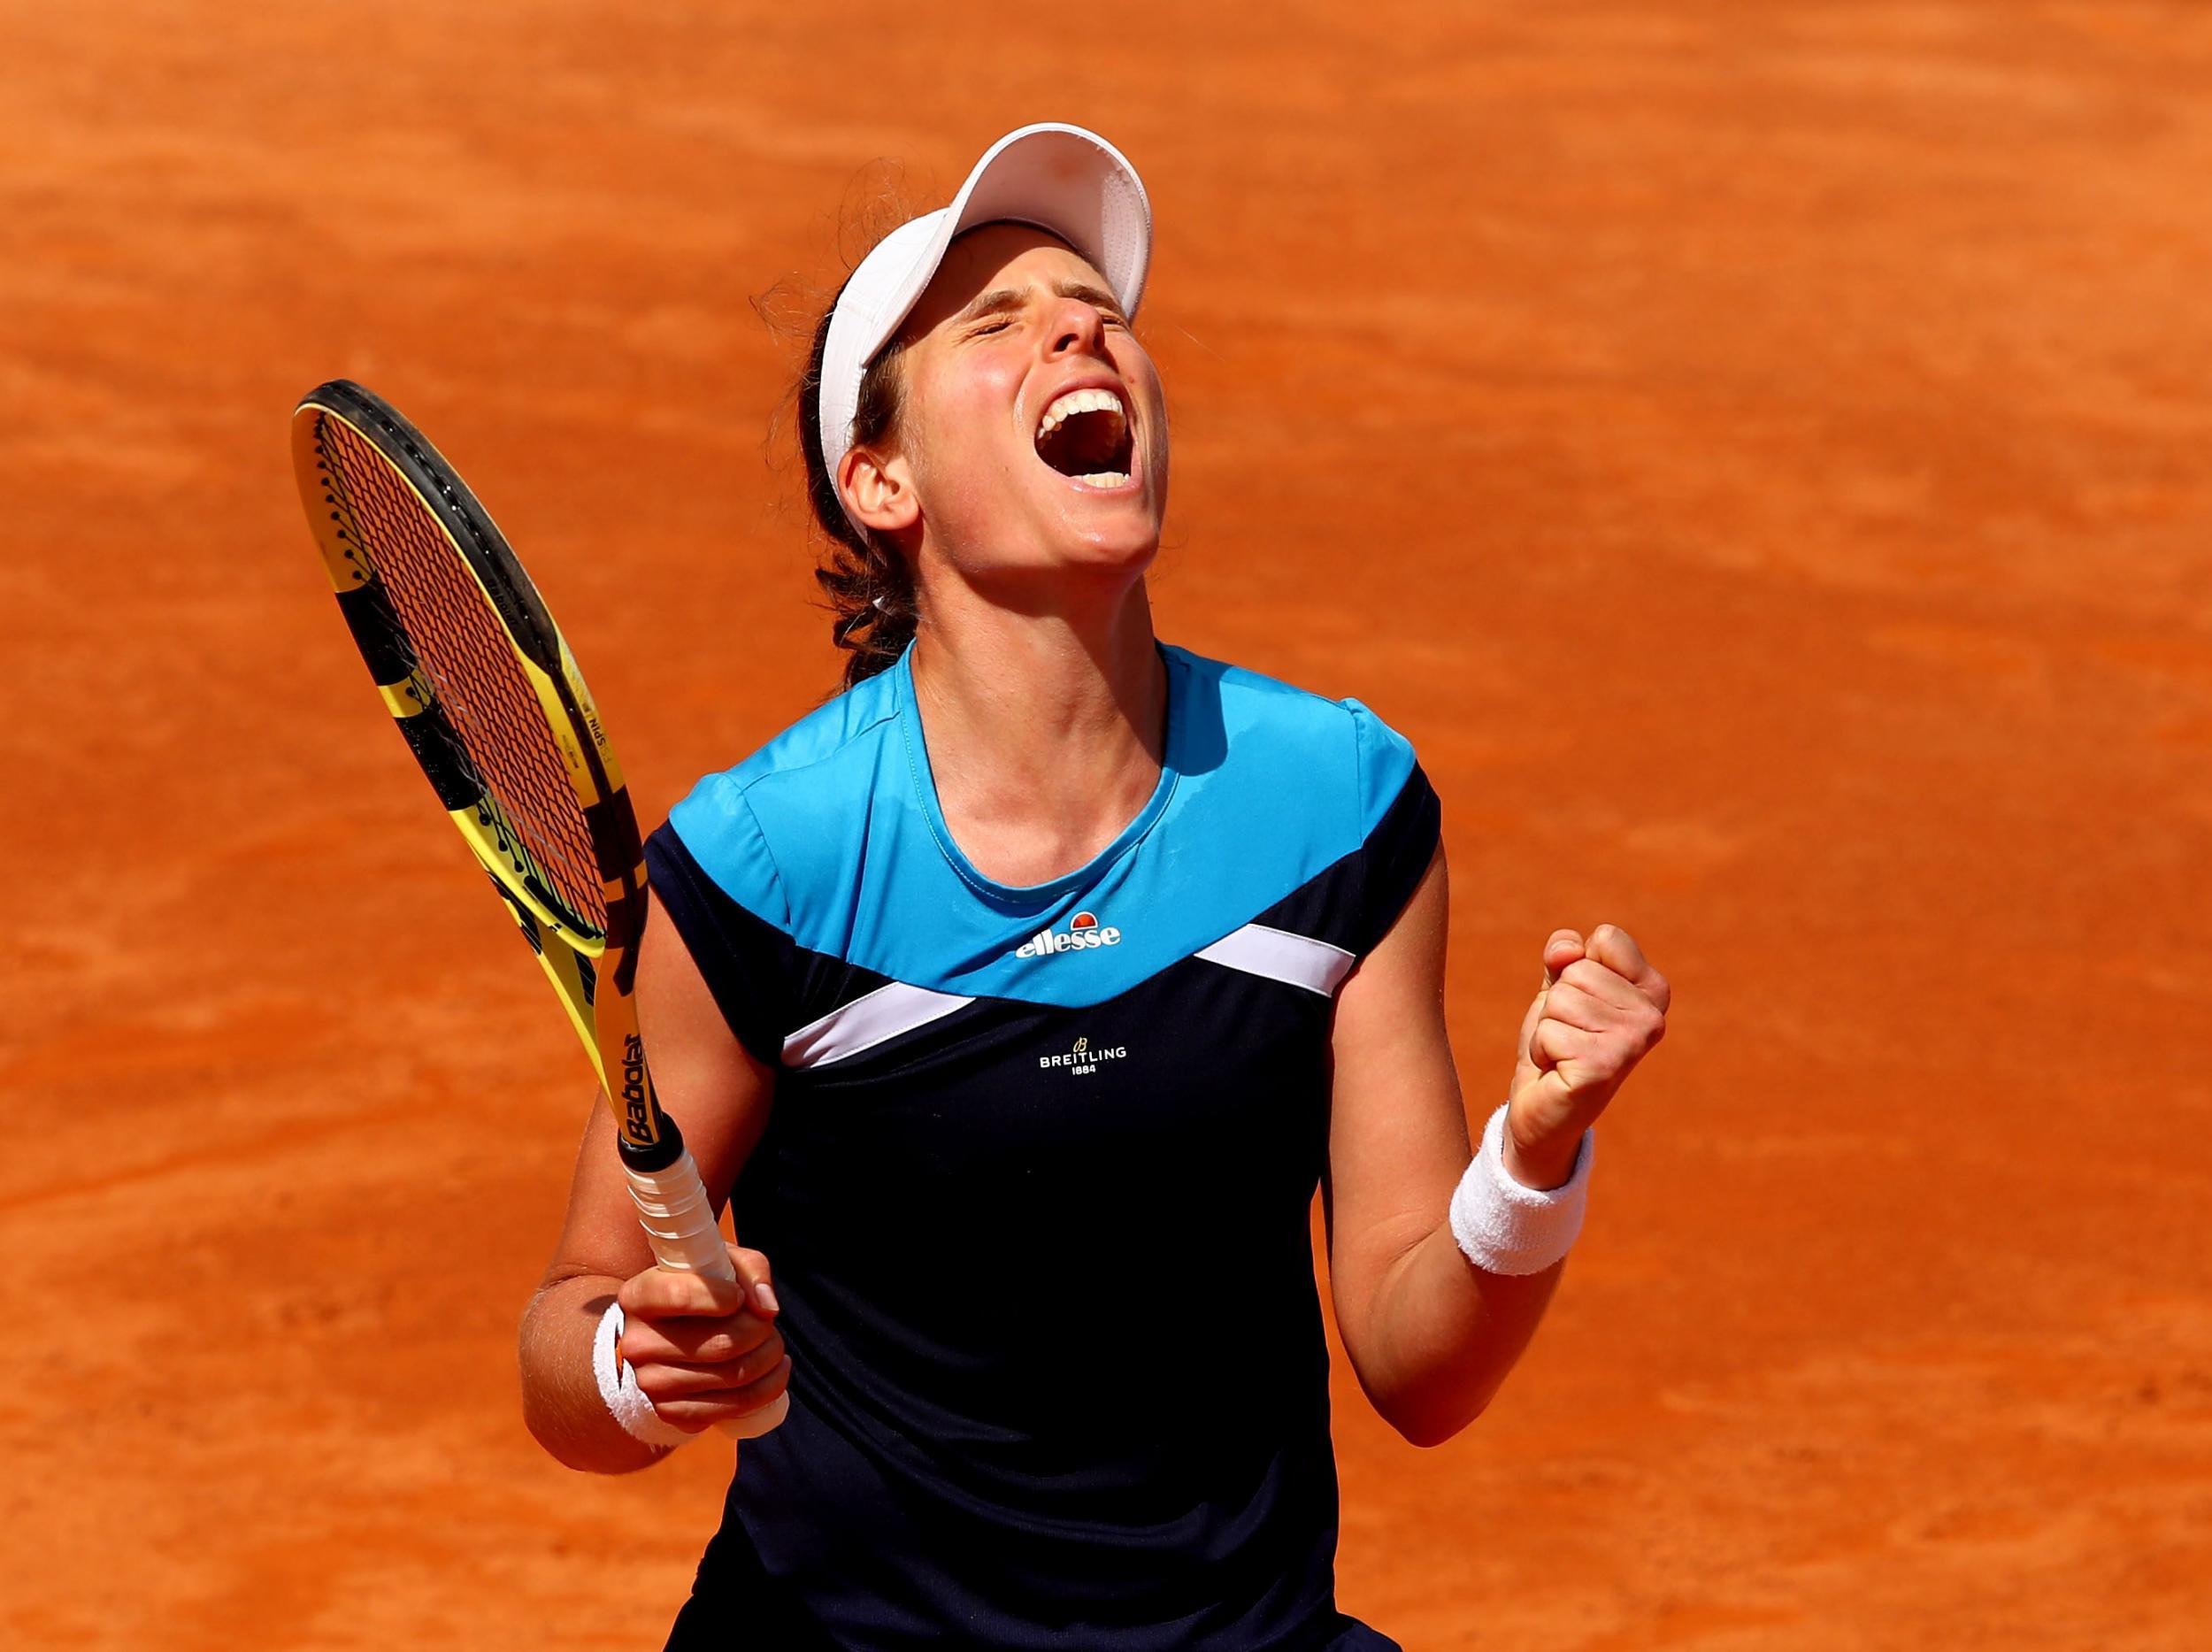 Italian Open 2019: Johanna Konta beats Kiki Bertens in close match to reach final